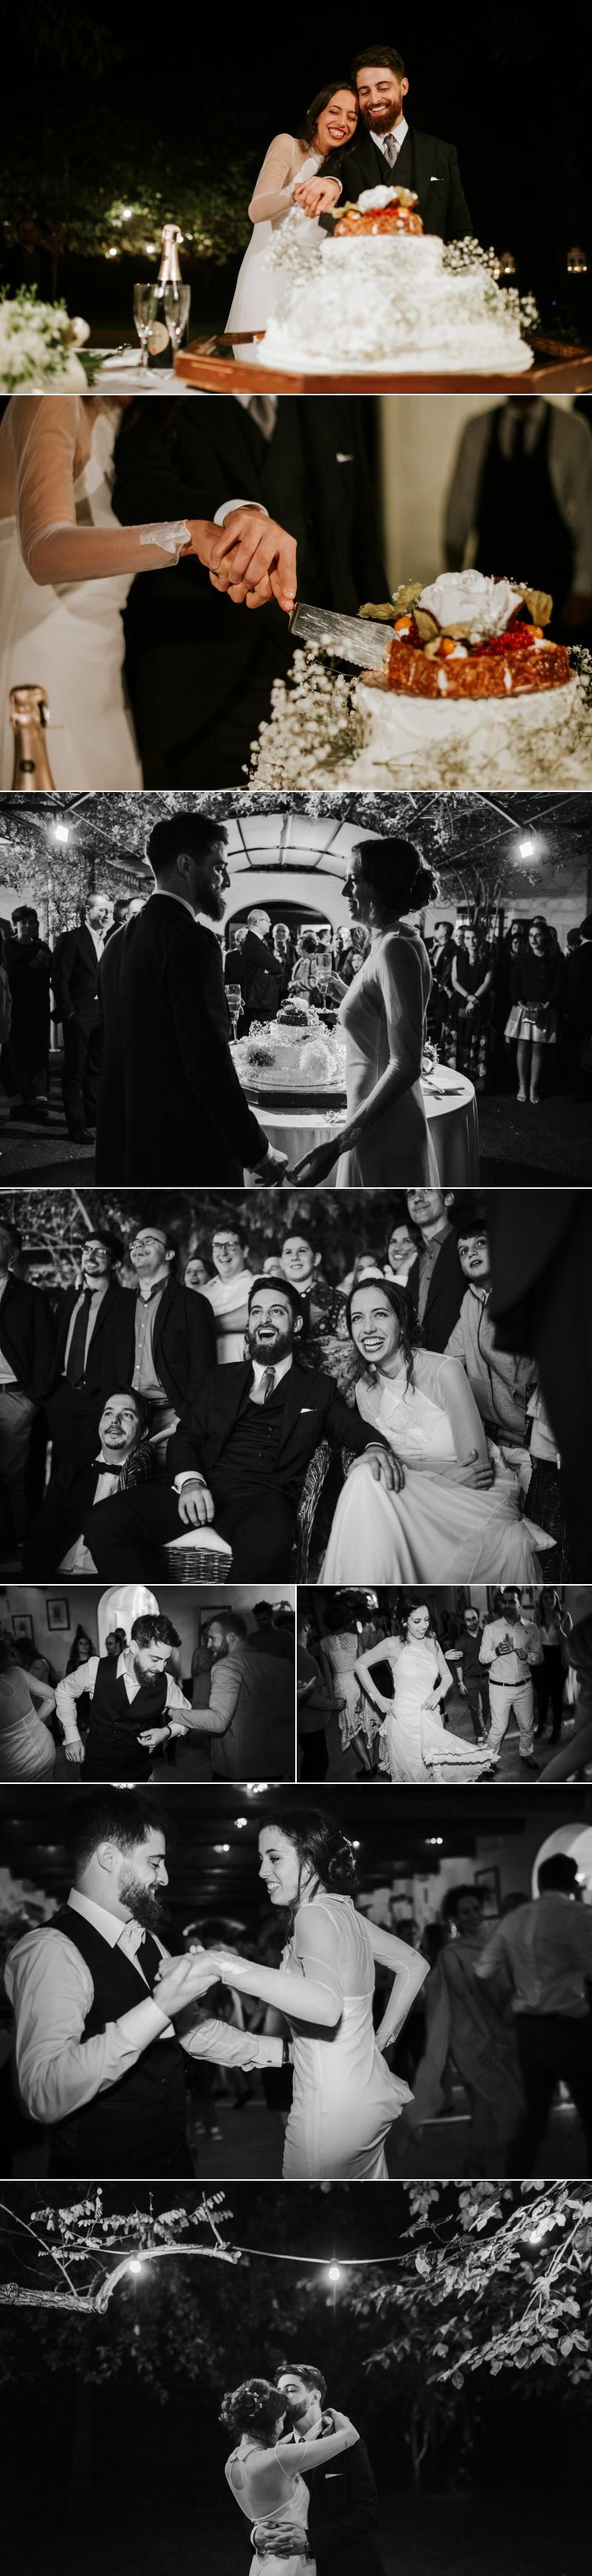 Bologna Ravenna Destination Wedding Photographer 11